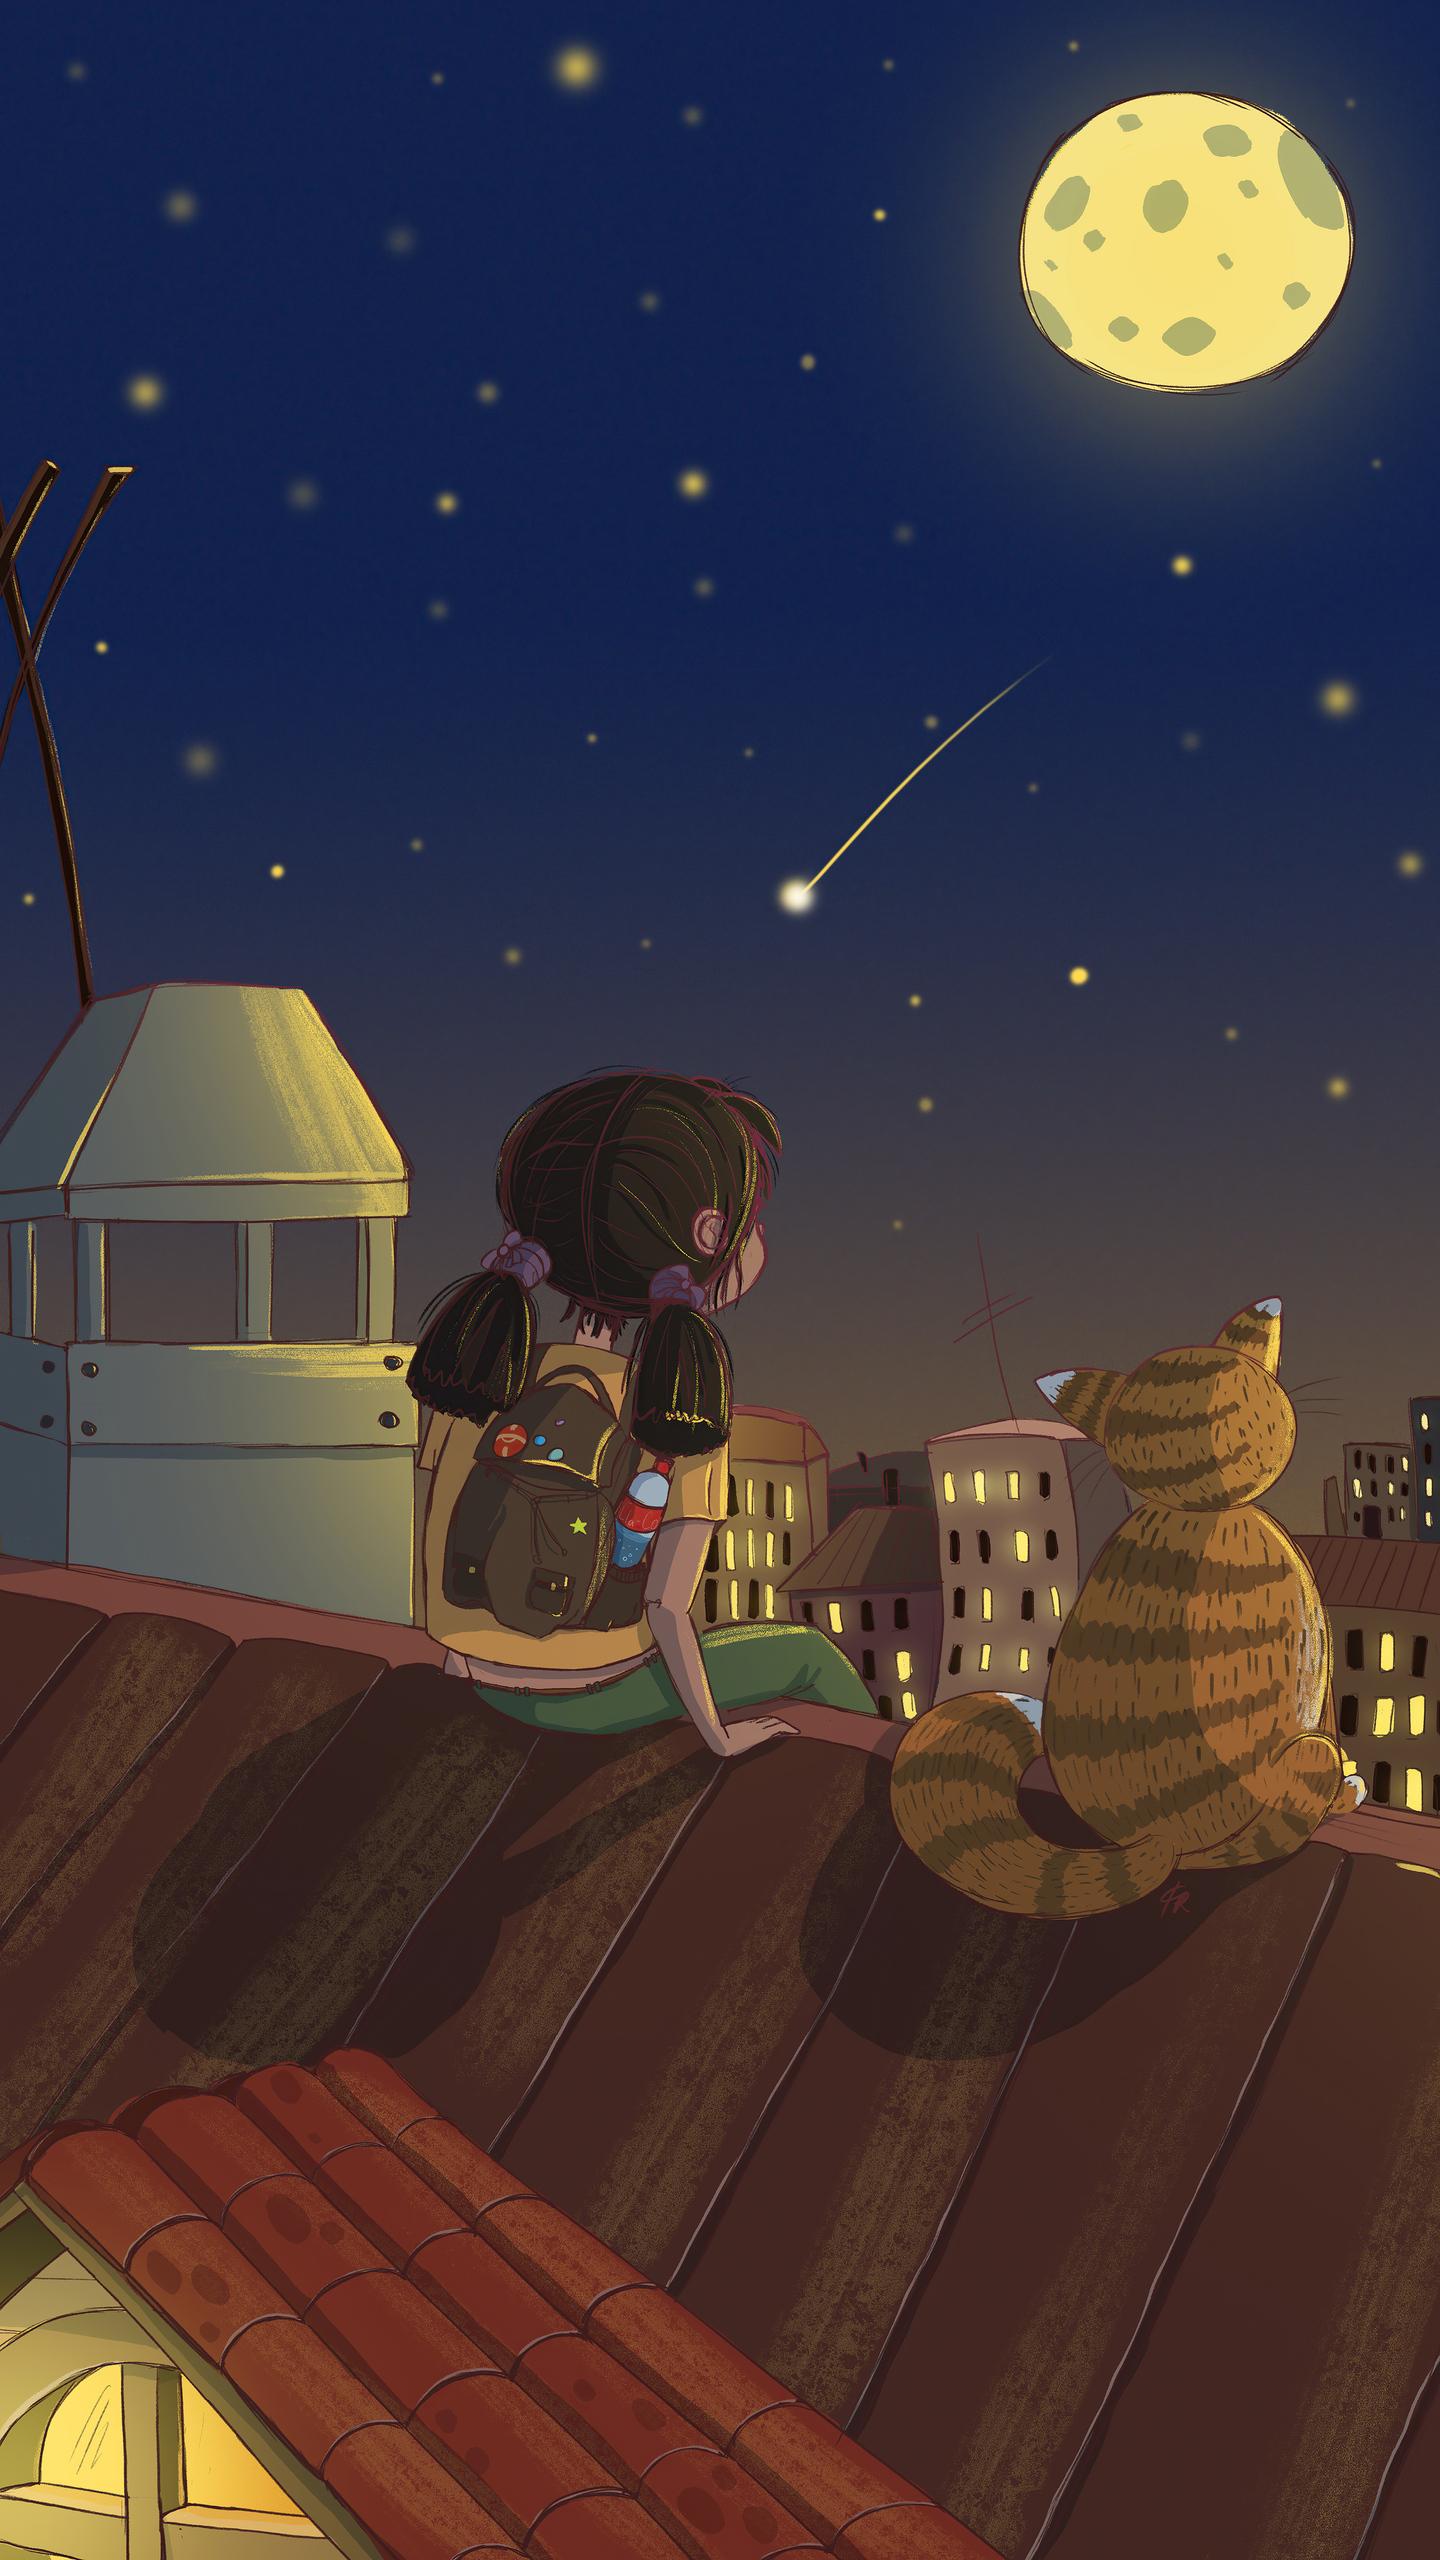 little-girl-looking-at-the-stars-with-cat-4k-kj.jpg